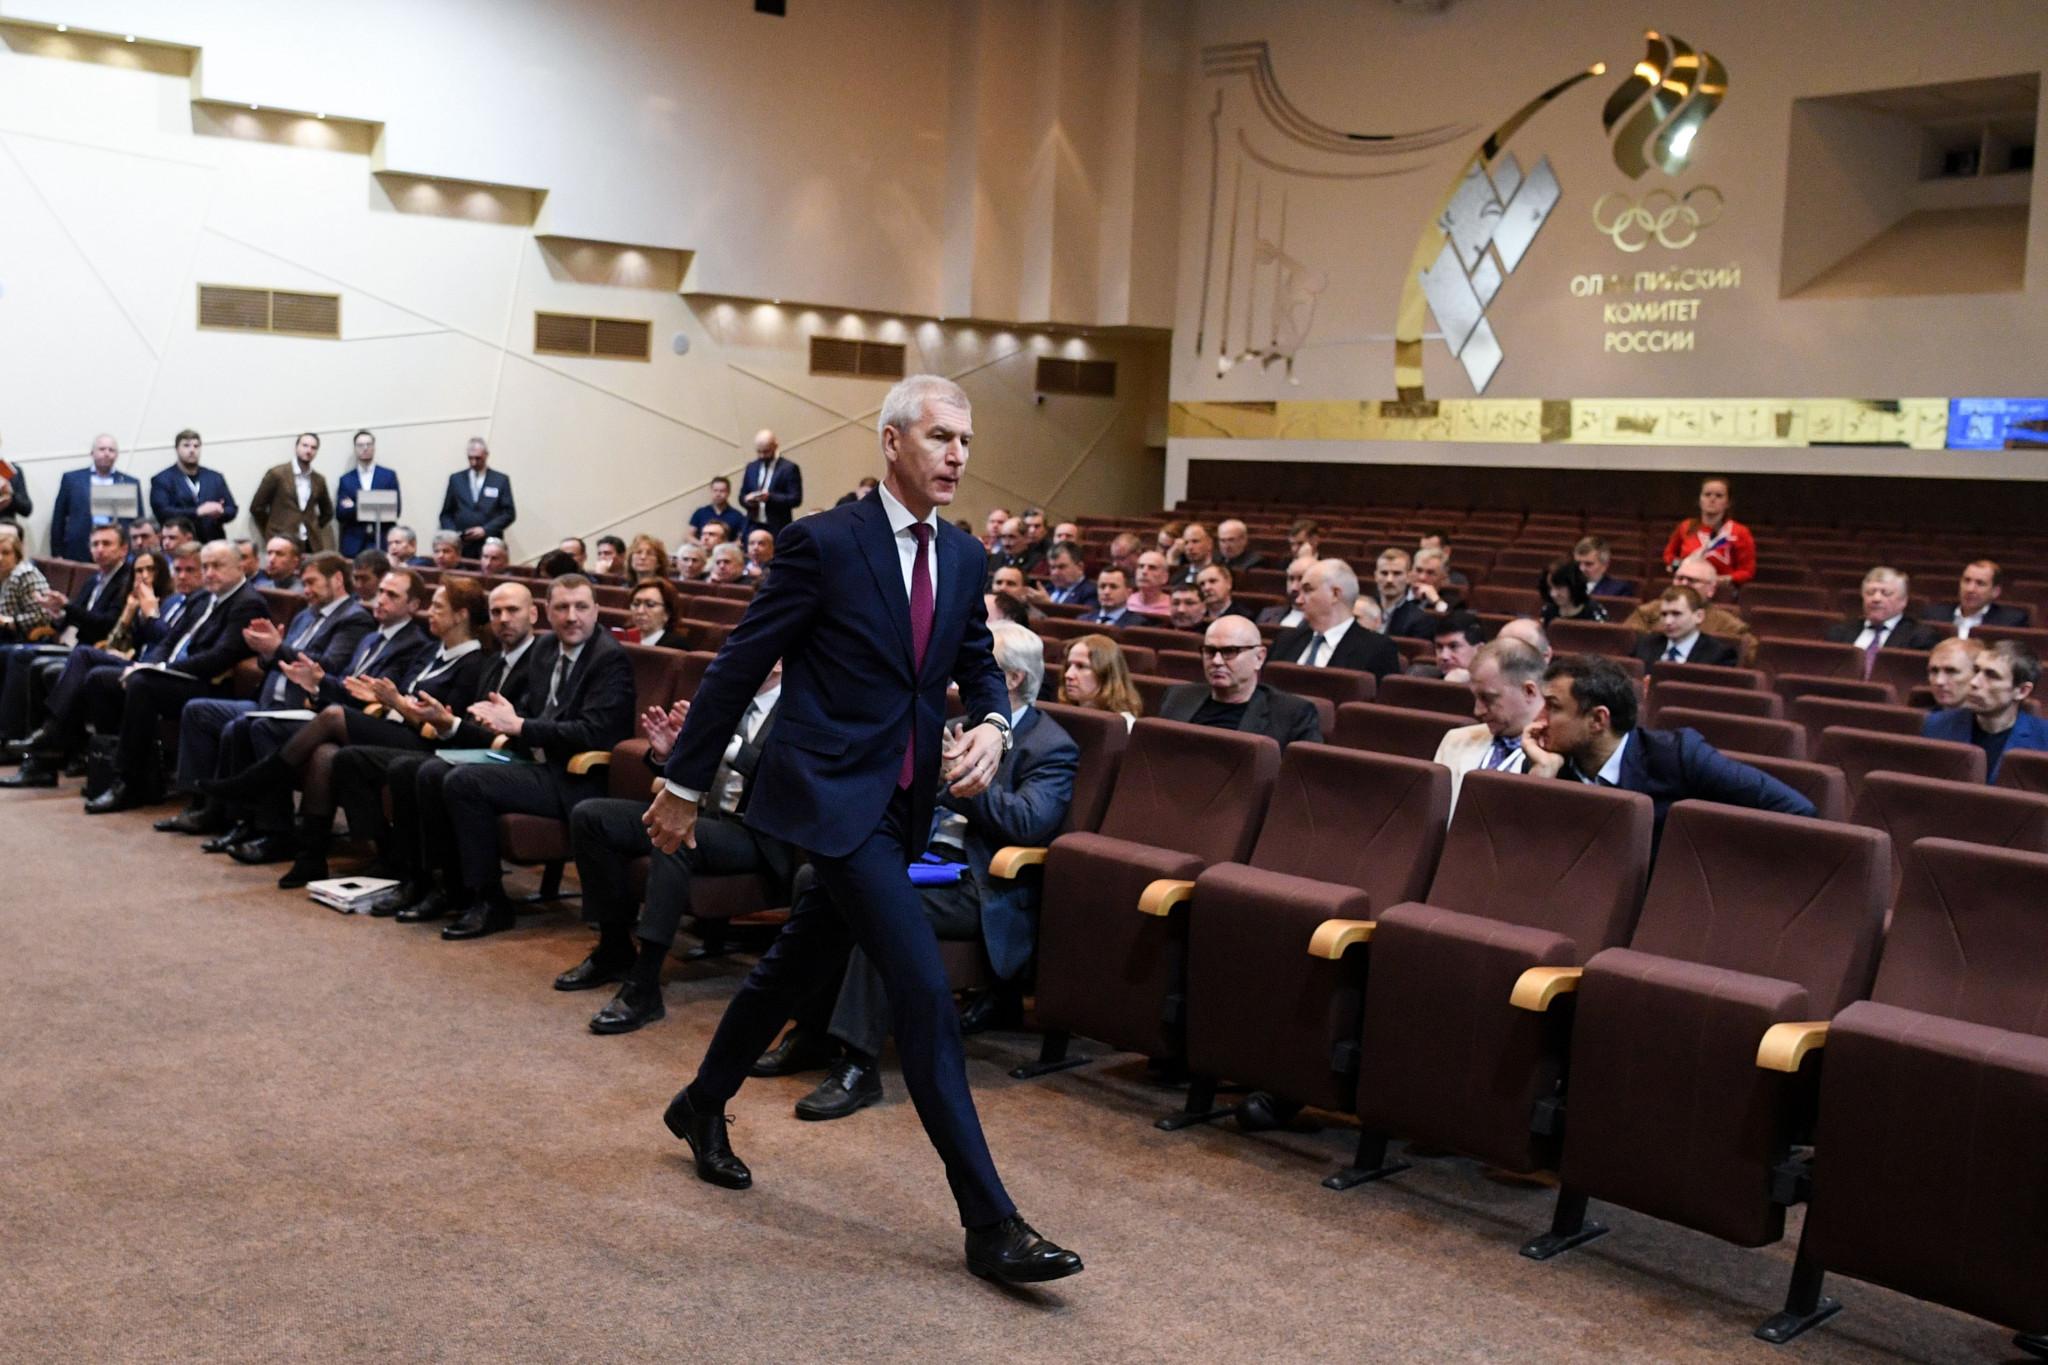 Russian Sports Minister Oleg Matytsin gave a last-ditch